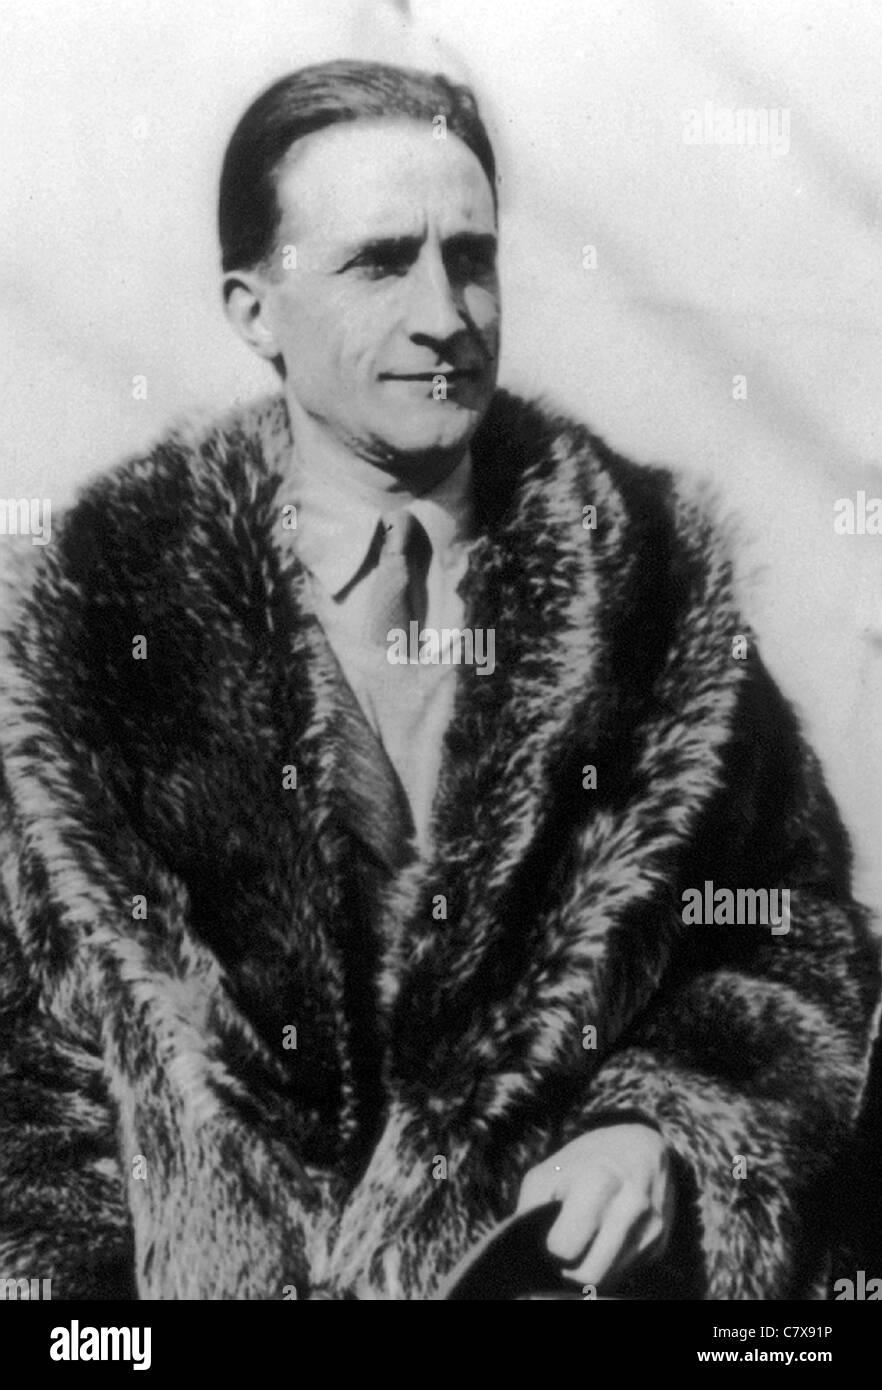 MARCEL Duchamp (1887-1968) Artiste Français Photo Stock